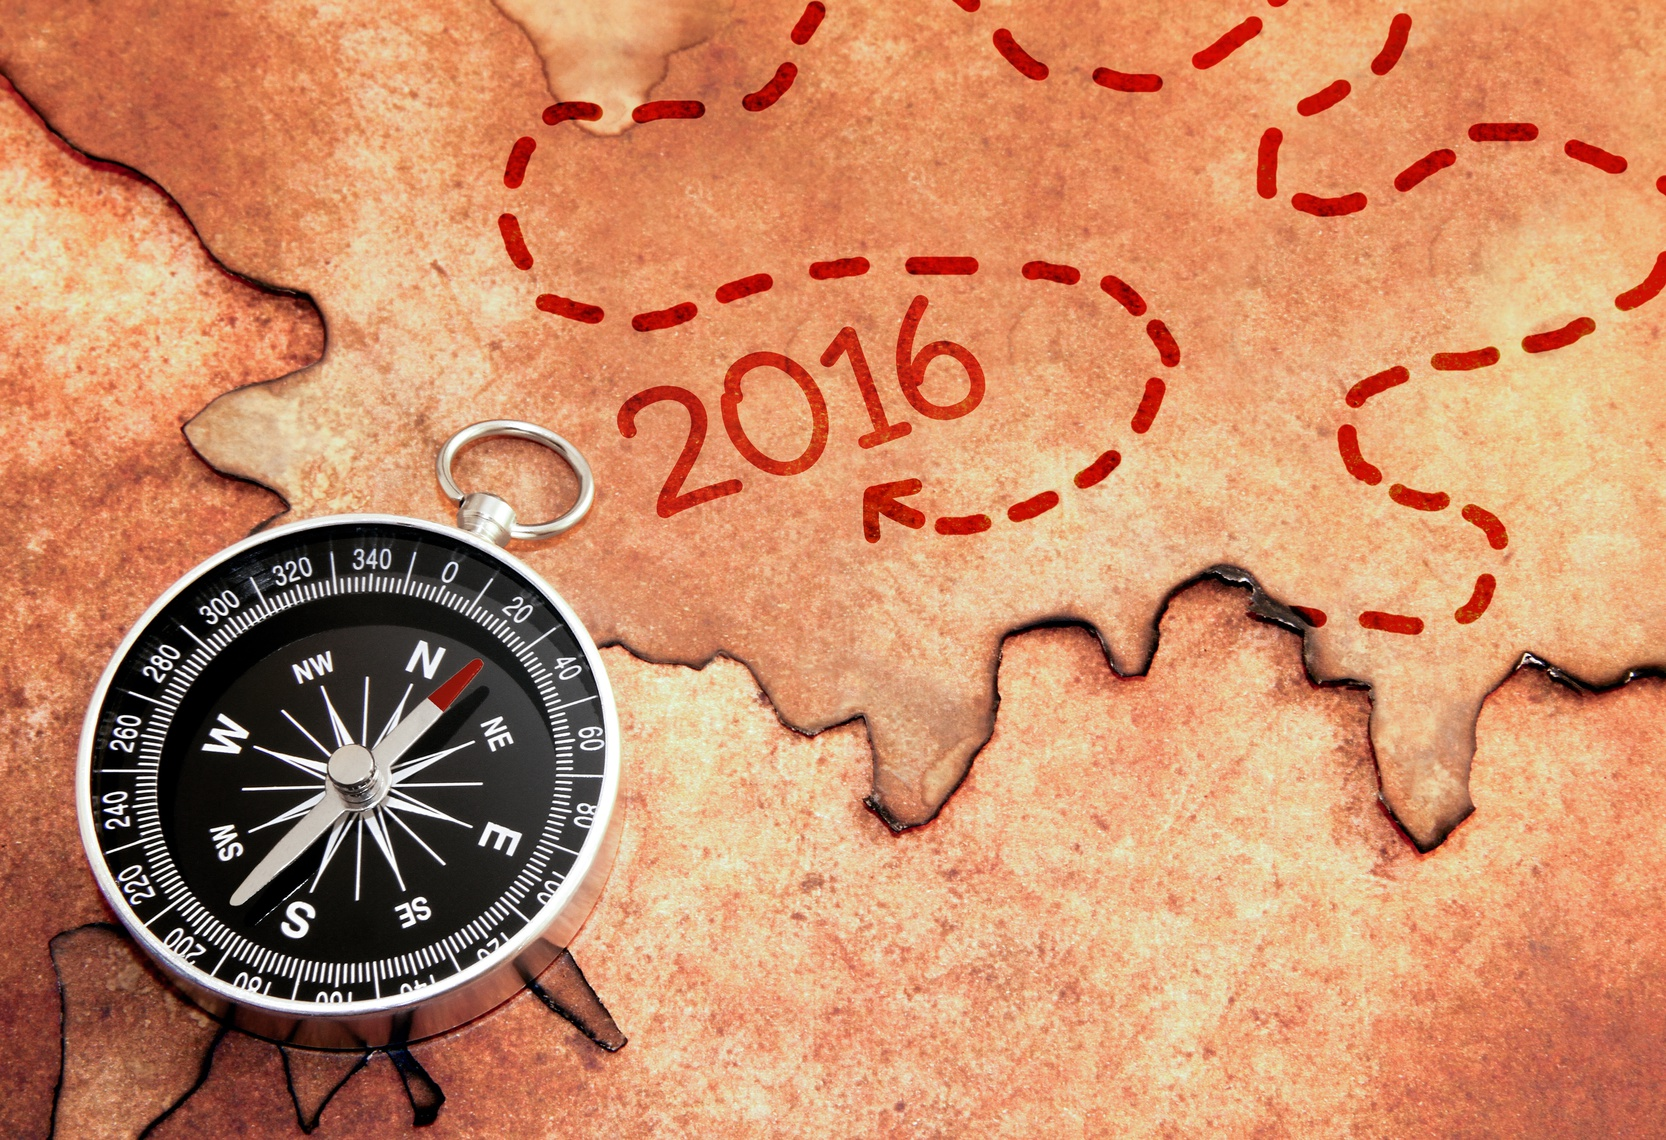 97601091 - Der Weg ins Jahr 2016 © stockpics